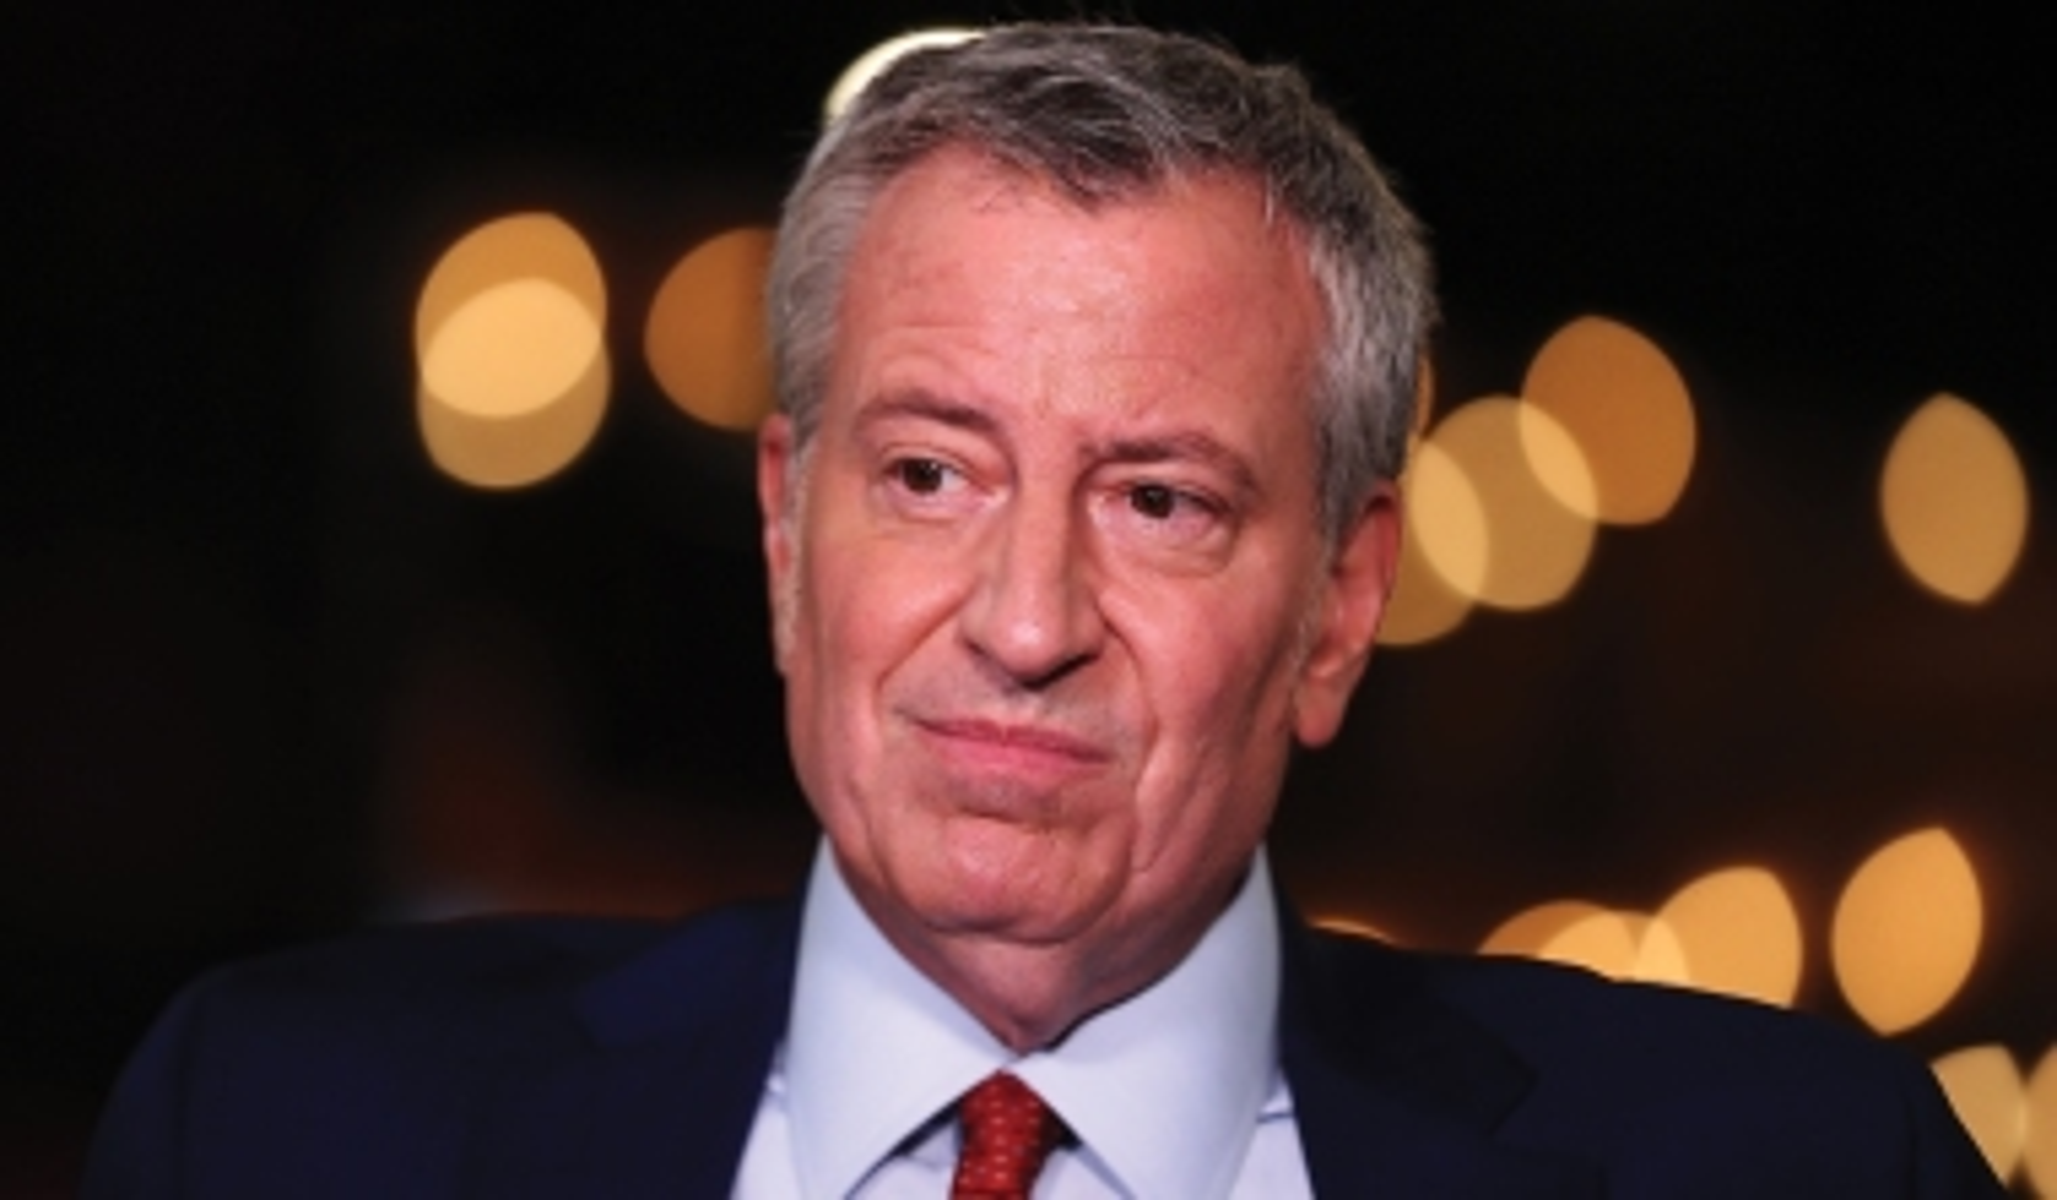 Bill de Blasio and the Decline of New York City